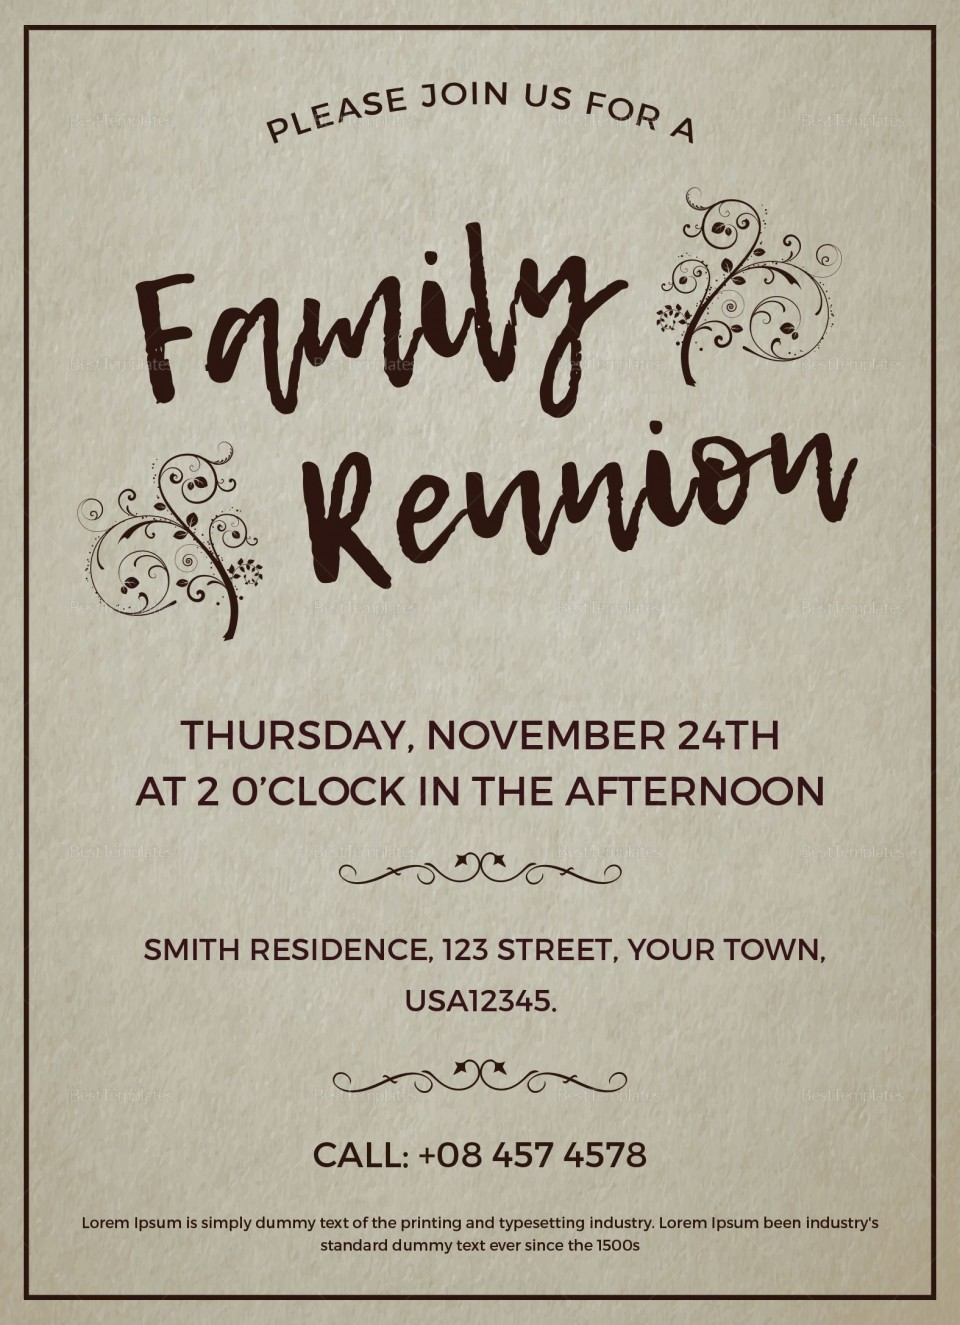 003 Excellent Free Downloadable Family Reunion Flyer Template Concept 960